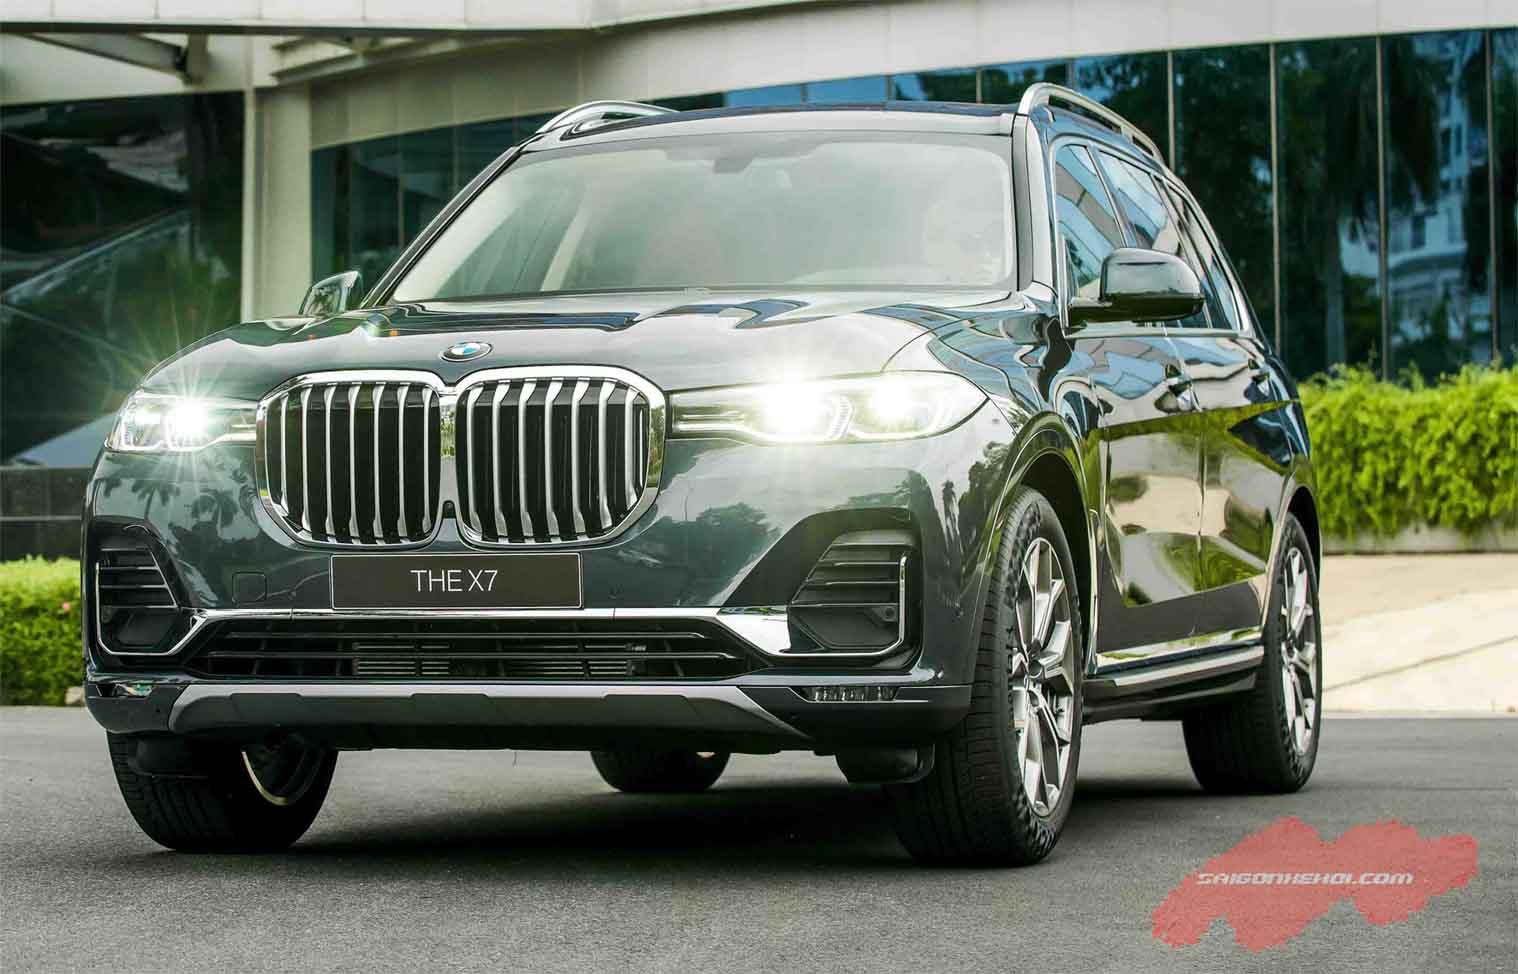 Giá xe BMW X7 2020